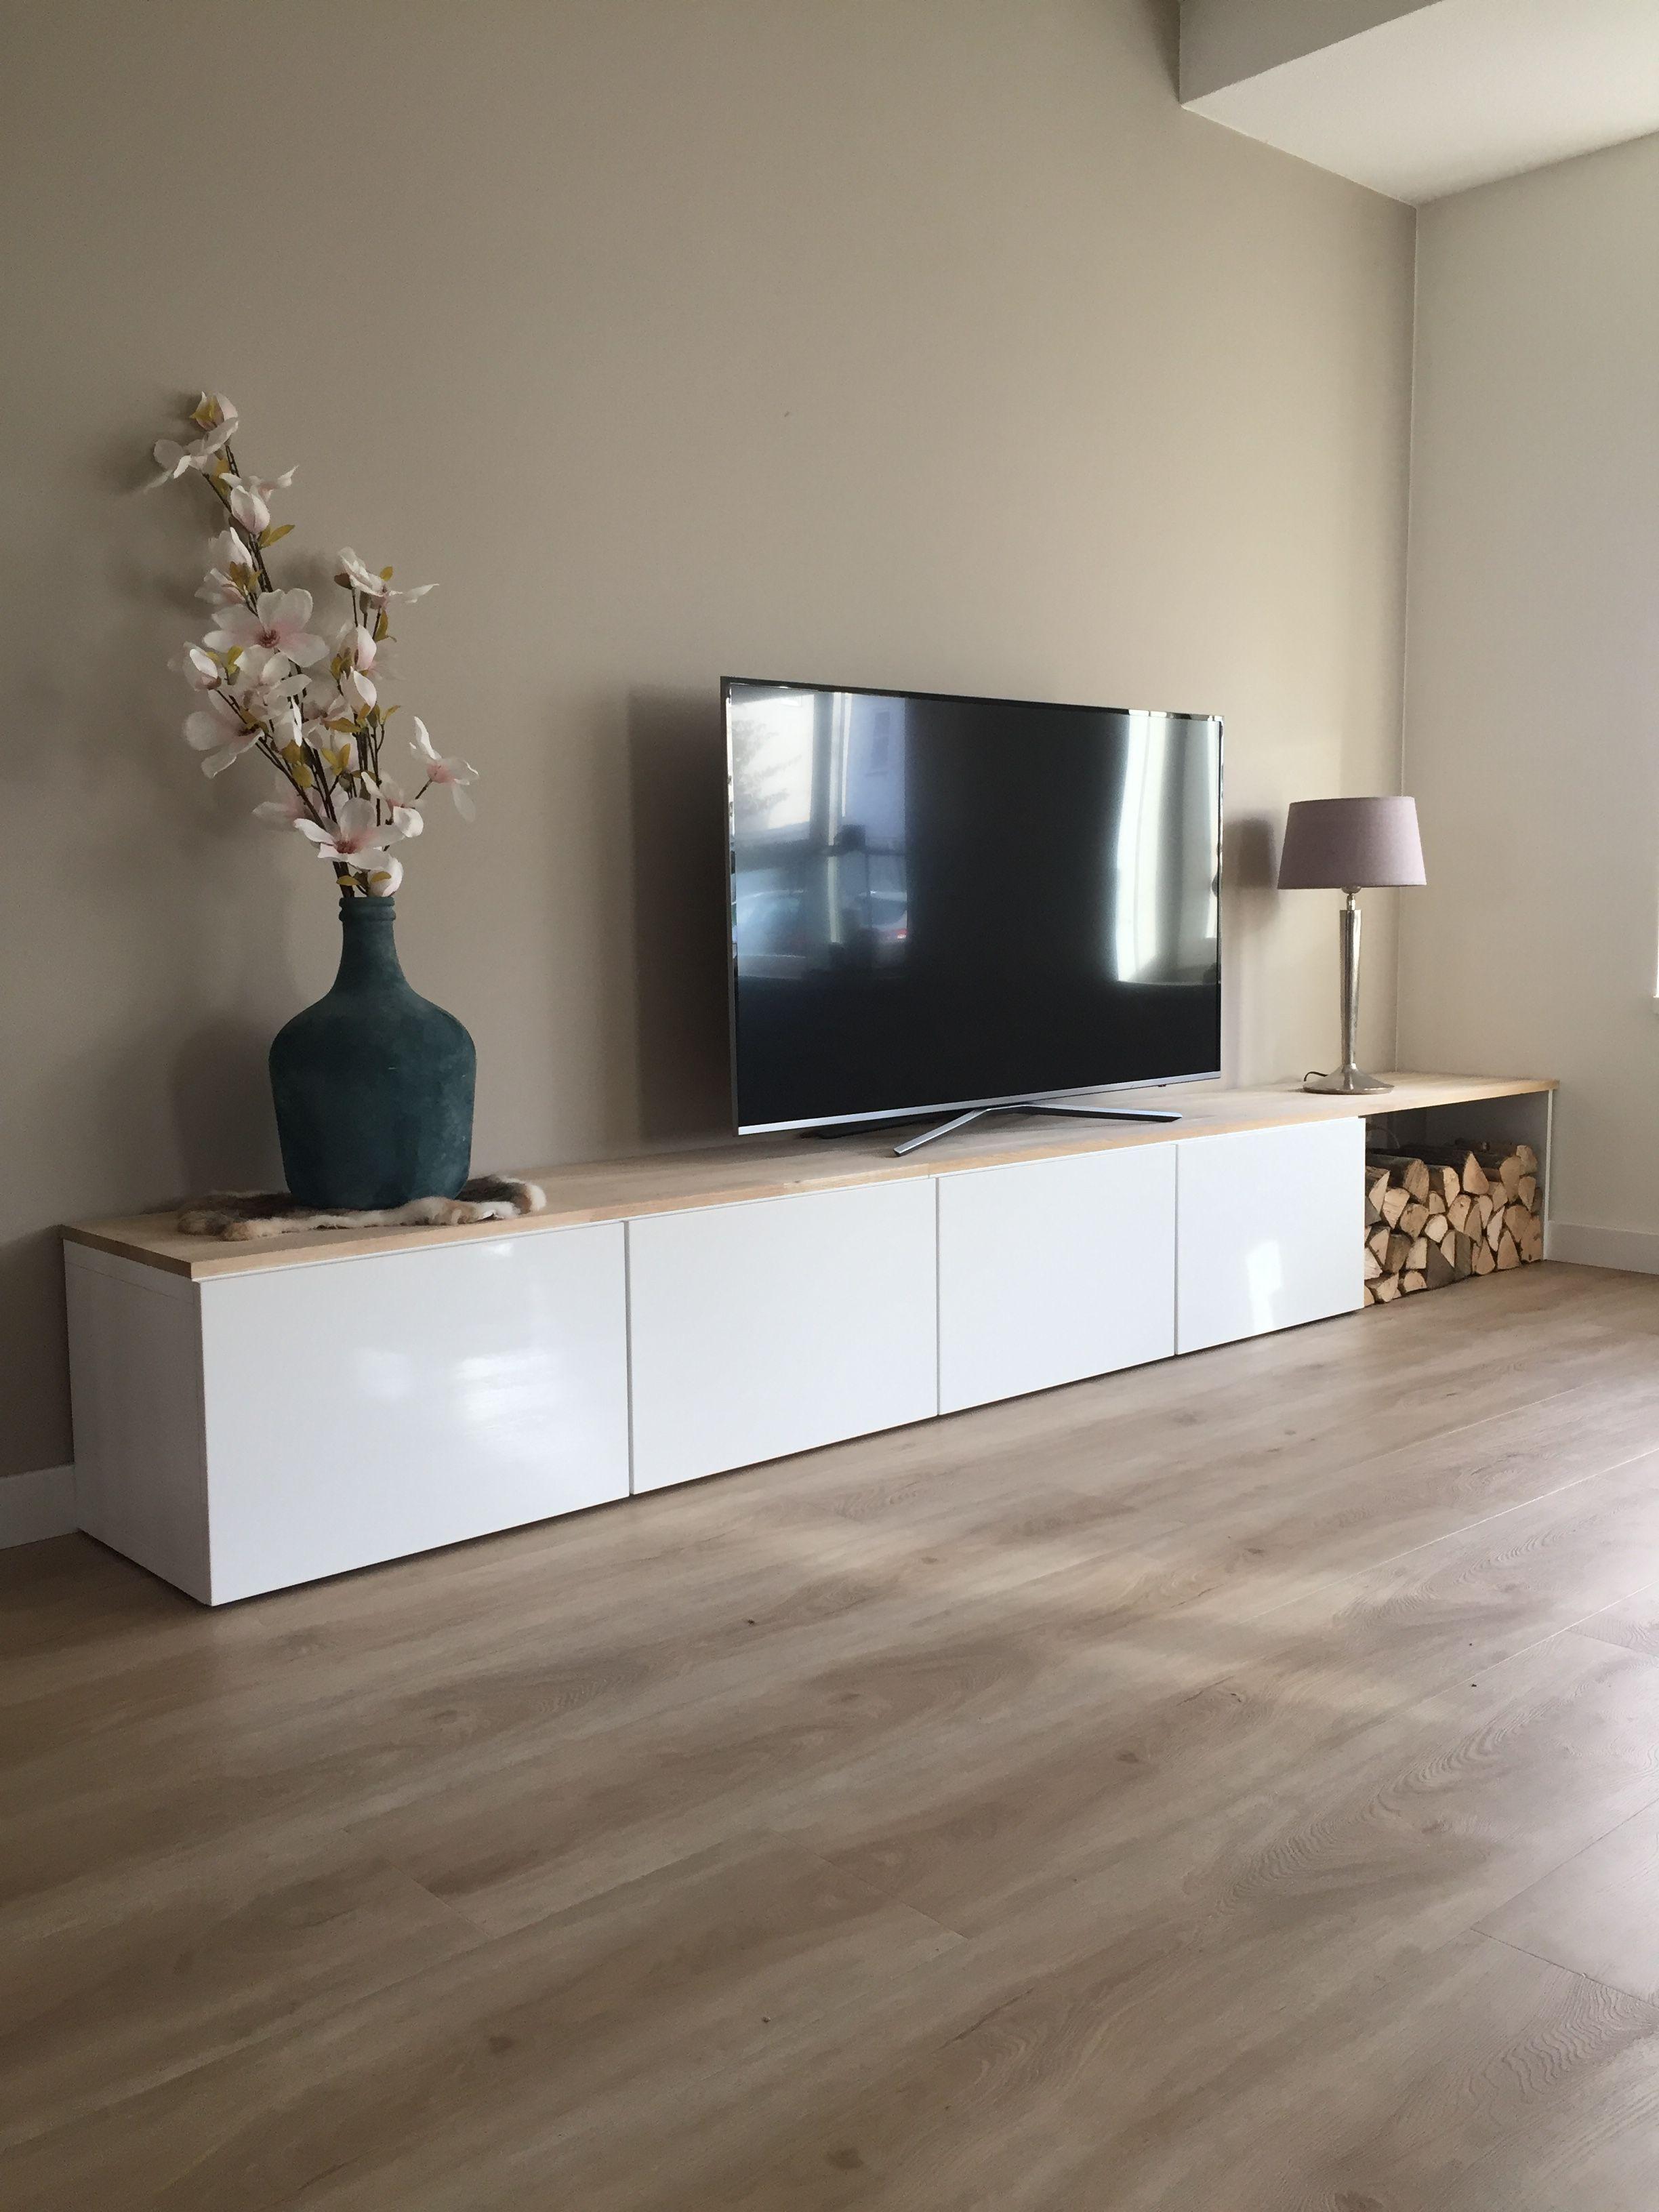 Tvmeubel #homemade #tv #blauwevaas #hout #wood #Samsung